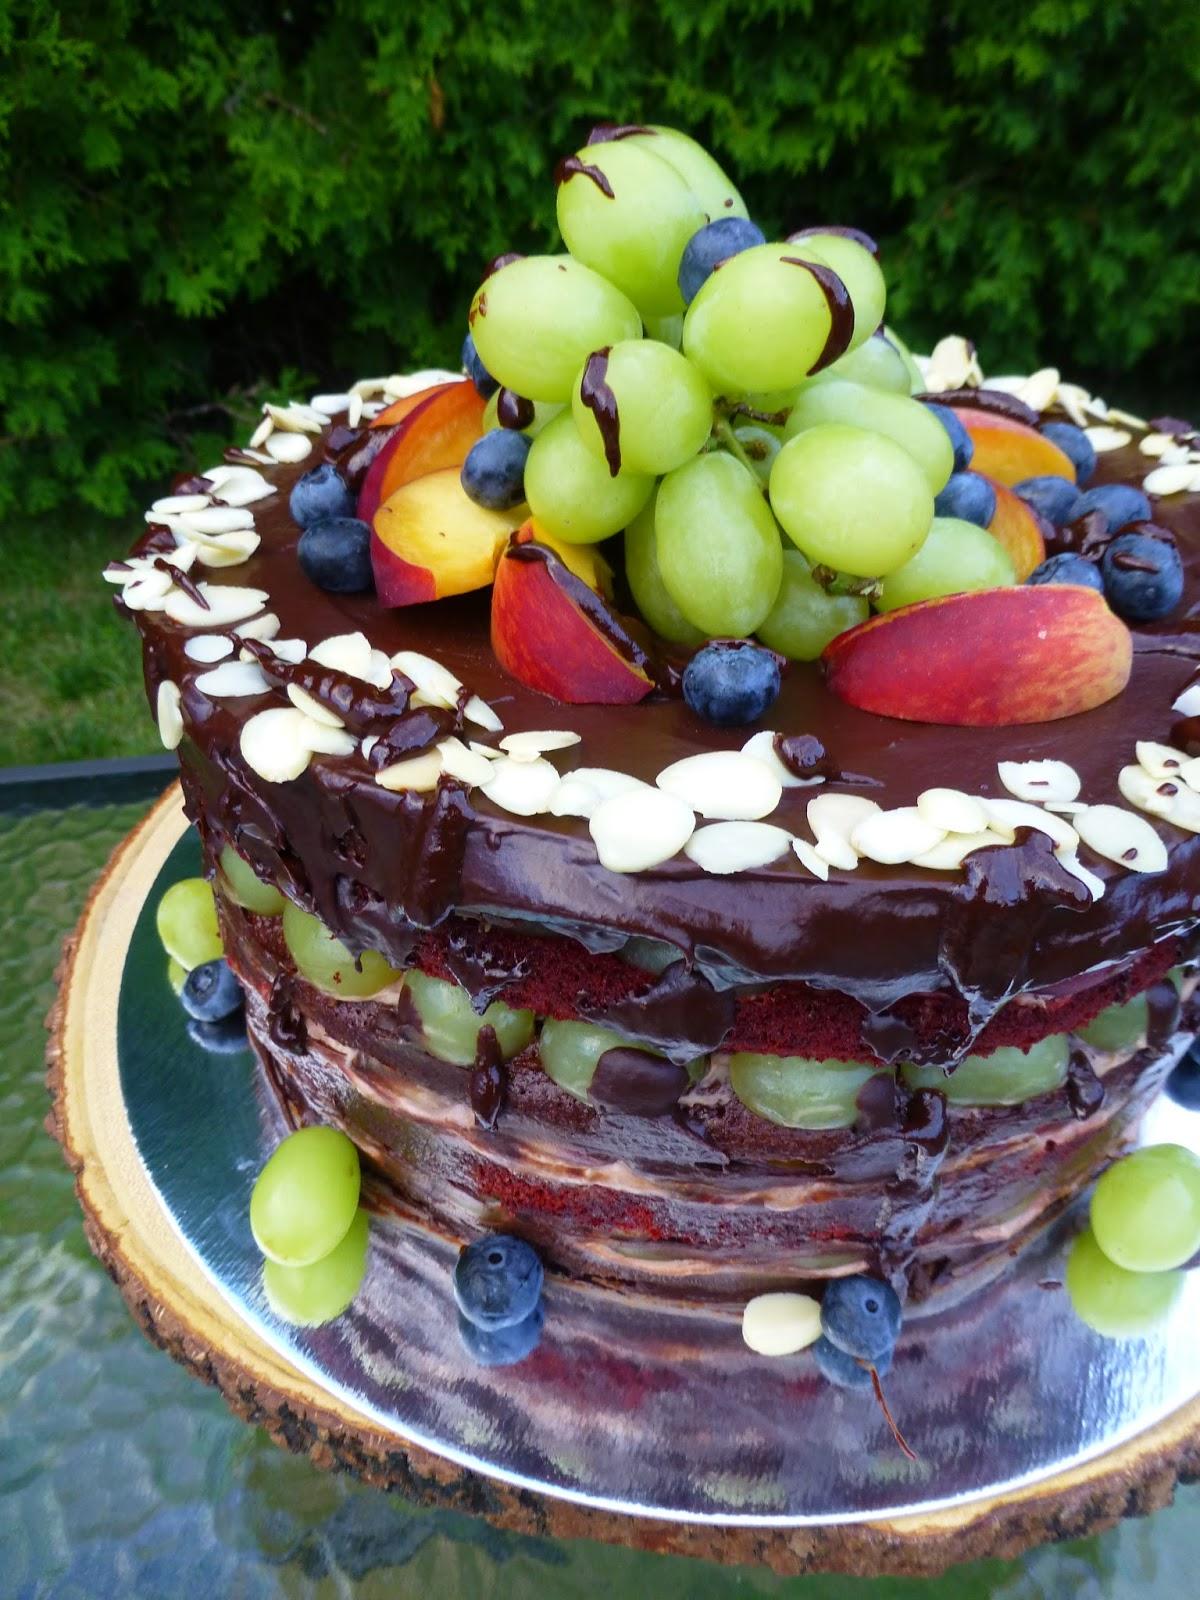 CakeSophia Cakes for my husband